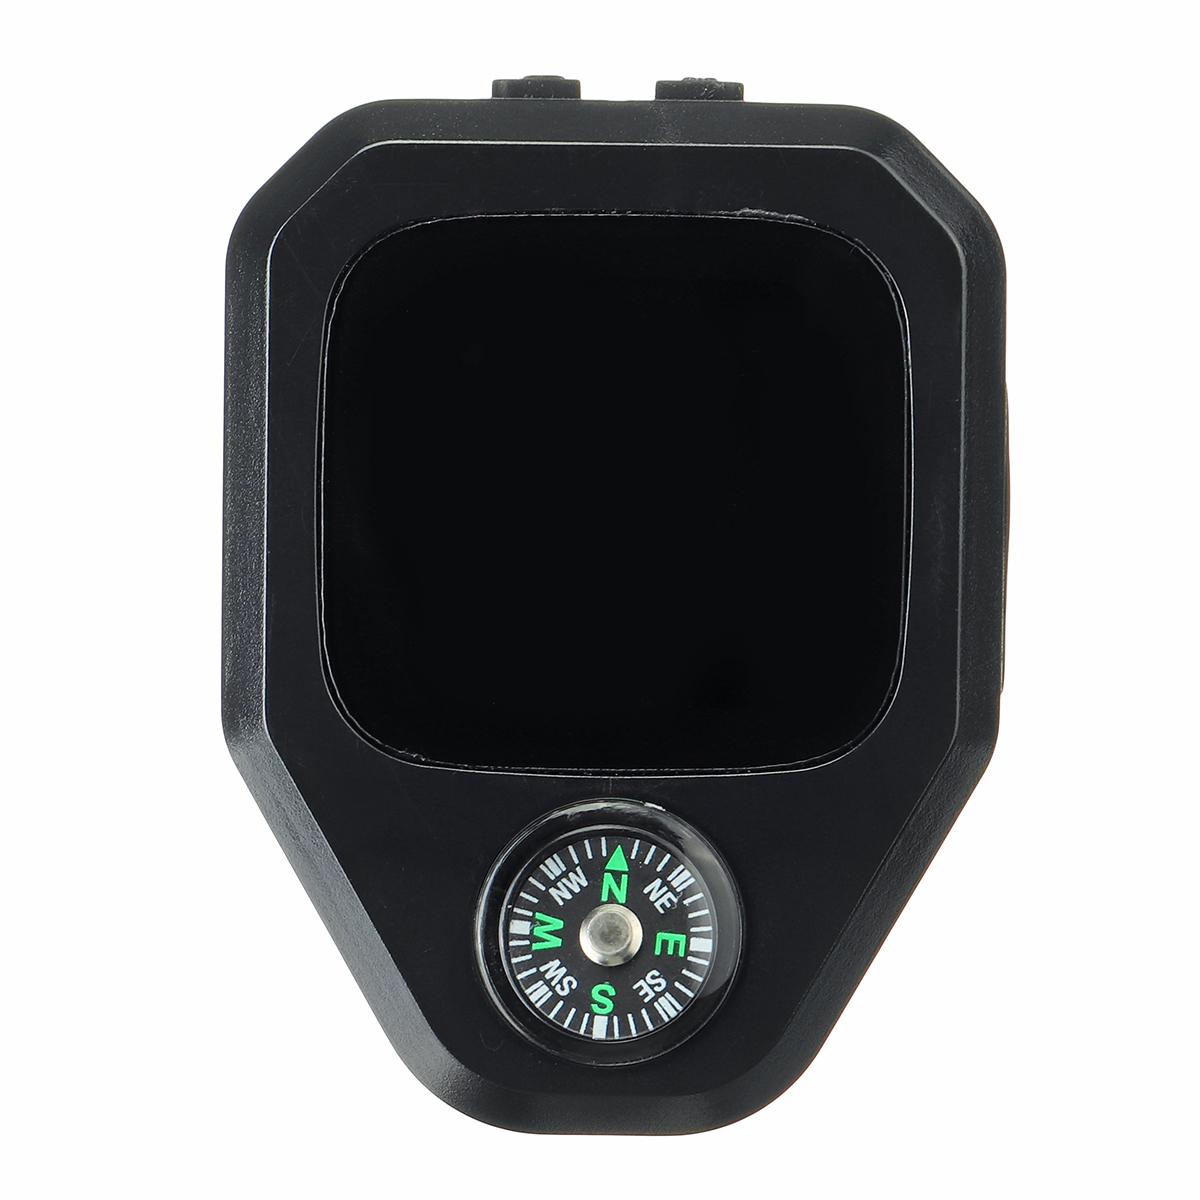 Motorcycle LCD Display Waterproof TPMS Real Time Tire Pressure Monitoring System External TH Sensors